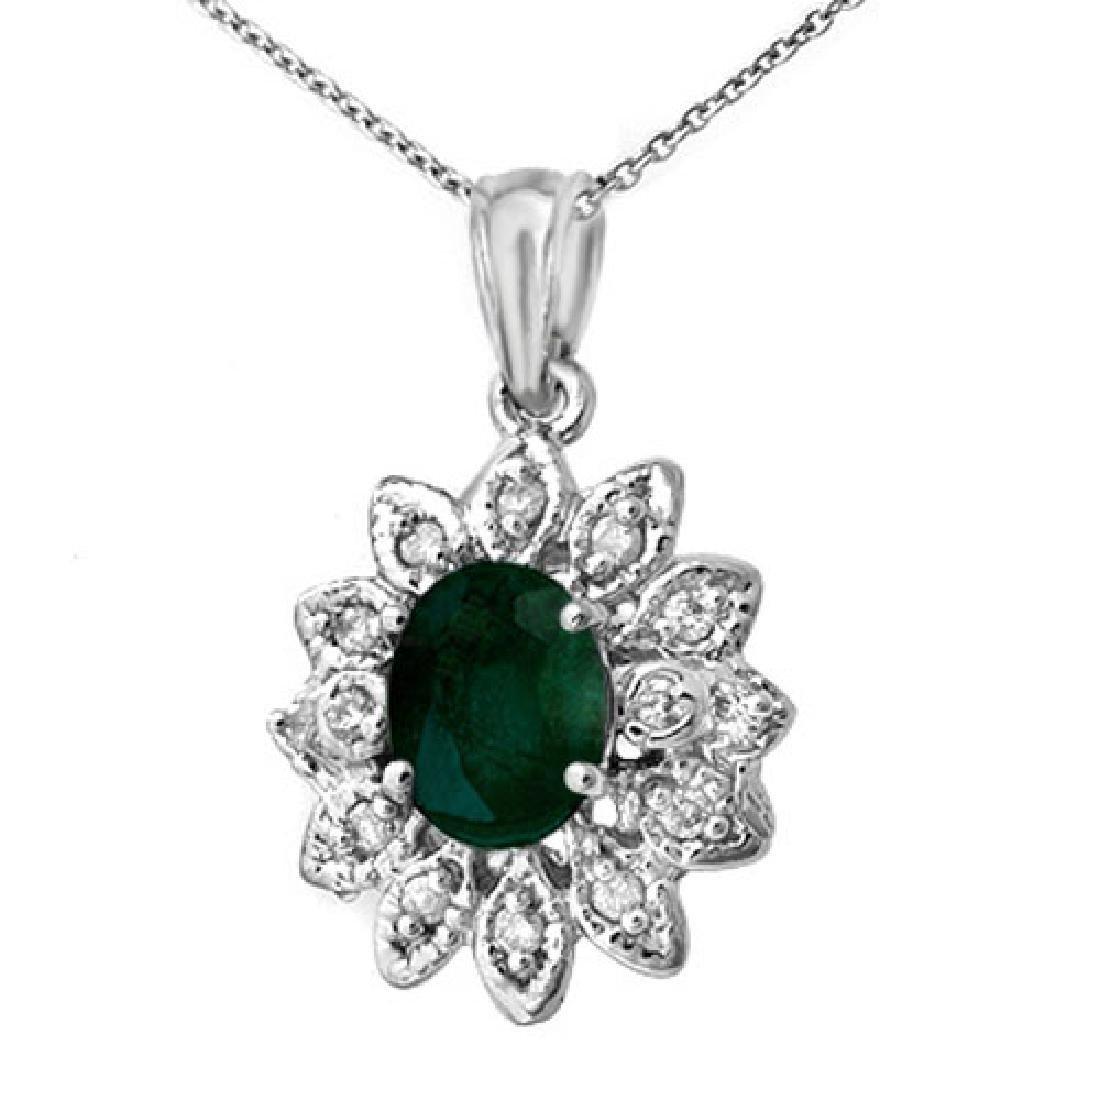 1.55 CTW Emerald & Diamond Pendant 14K White Gold